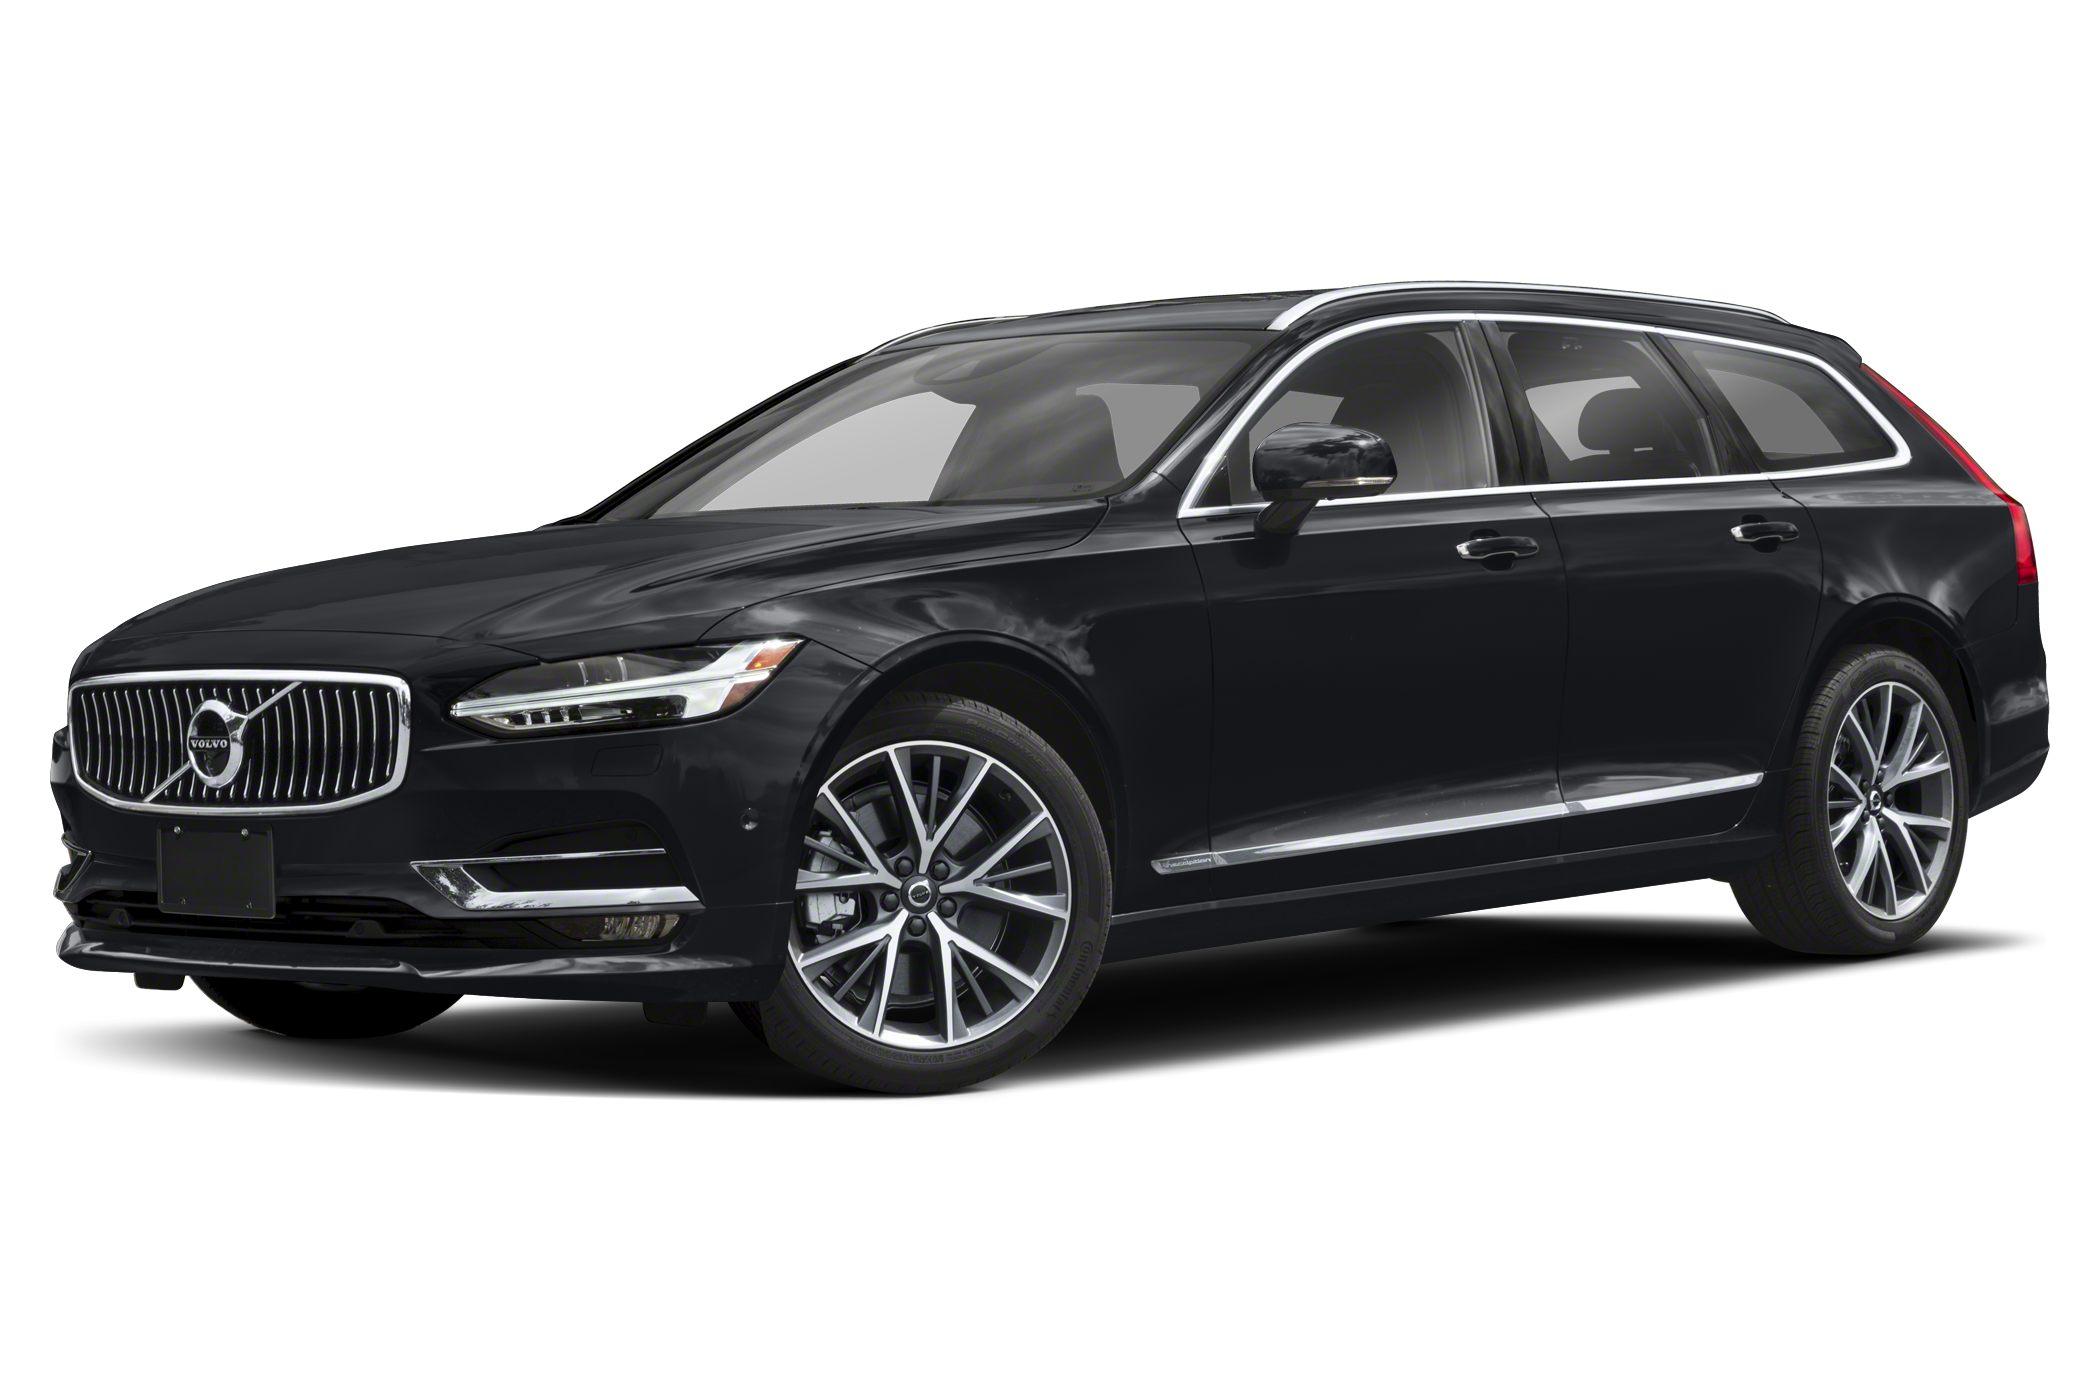 2019 Volvo V90 T5 Inscription 4dr Front-wheel Drive Wagon